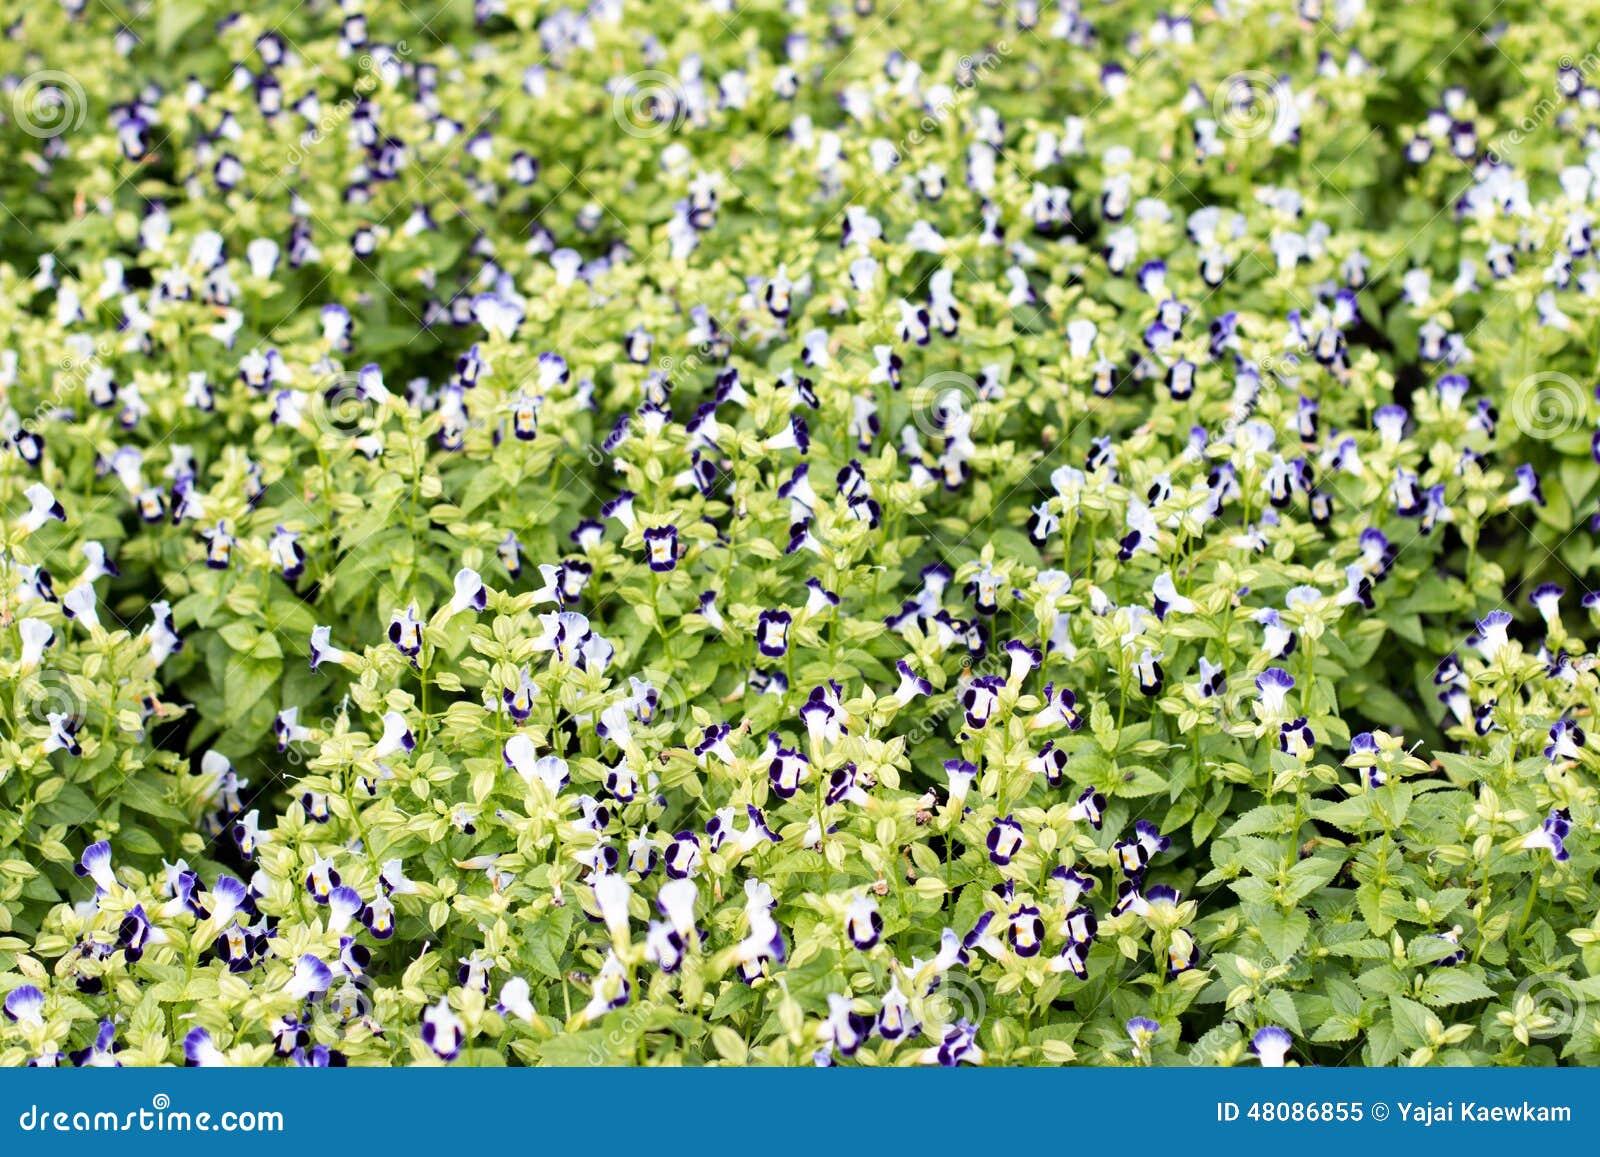 Small Blue Flower Shrub Stock Image Image Of Shrub Flower 48086855